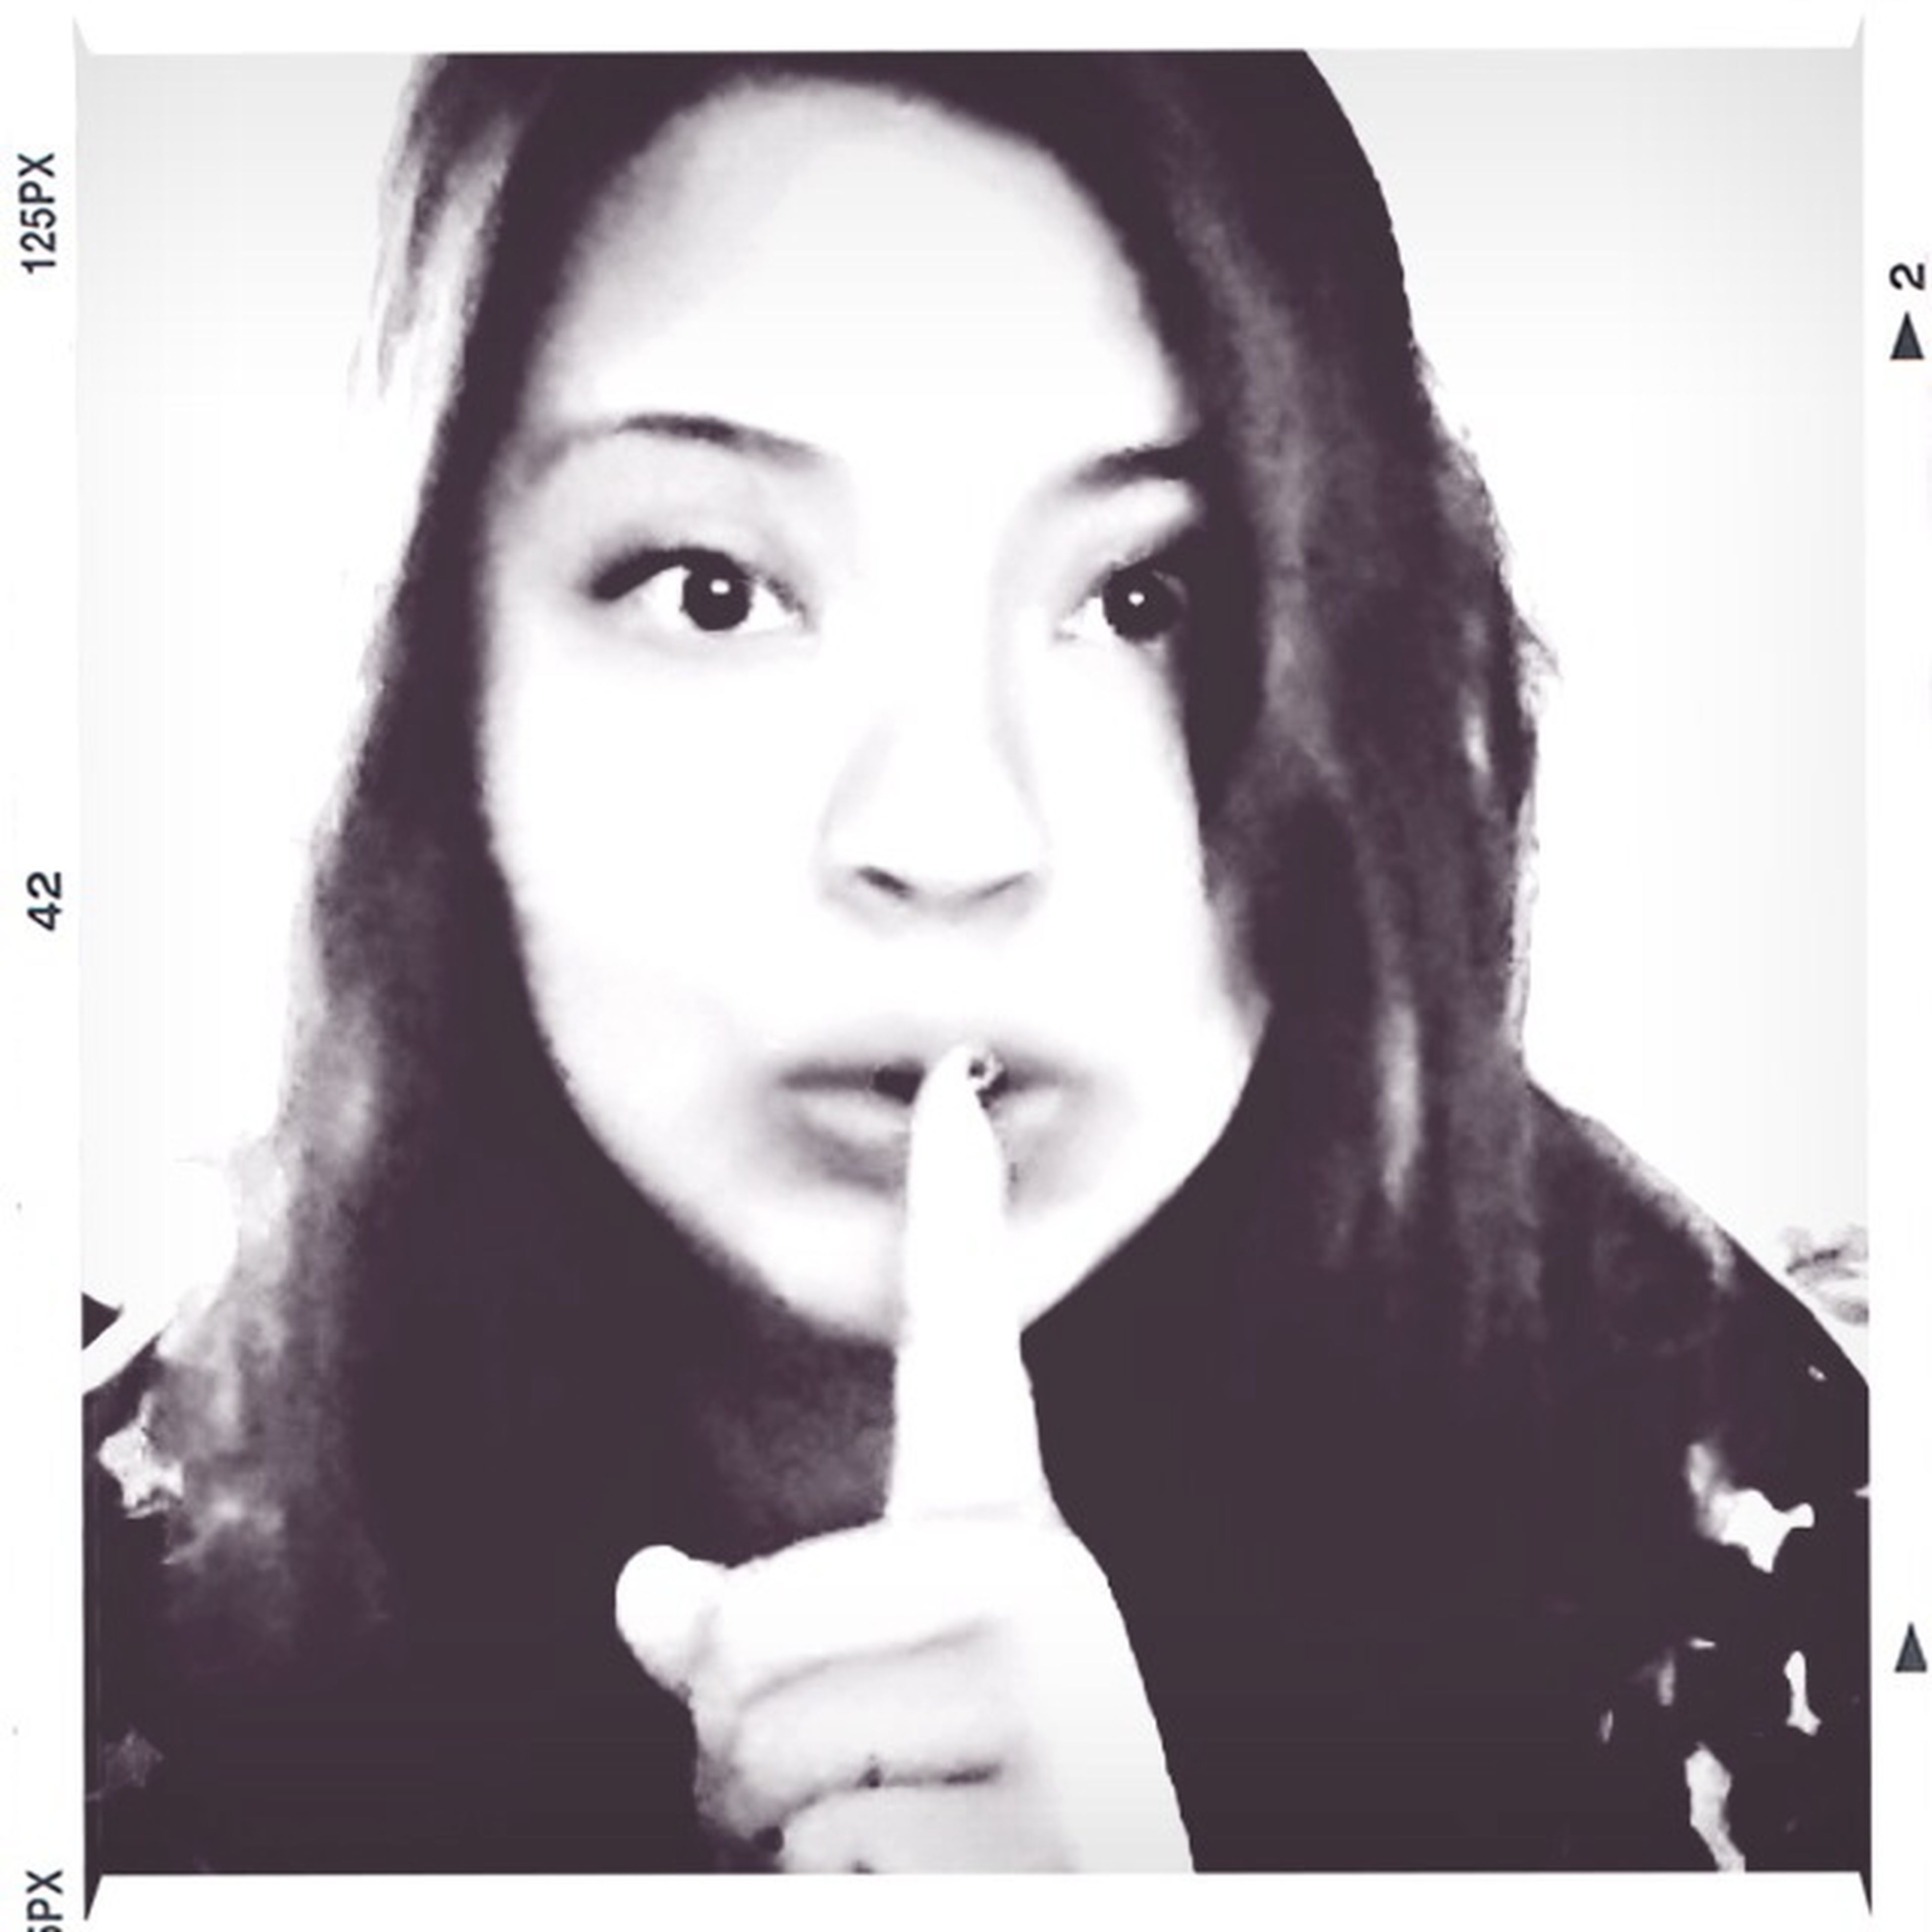 Shhhhh Adrinila Adrisphotos